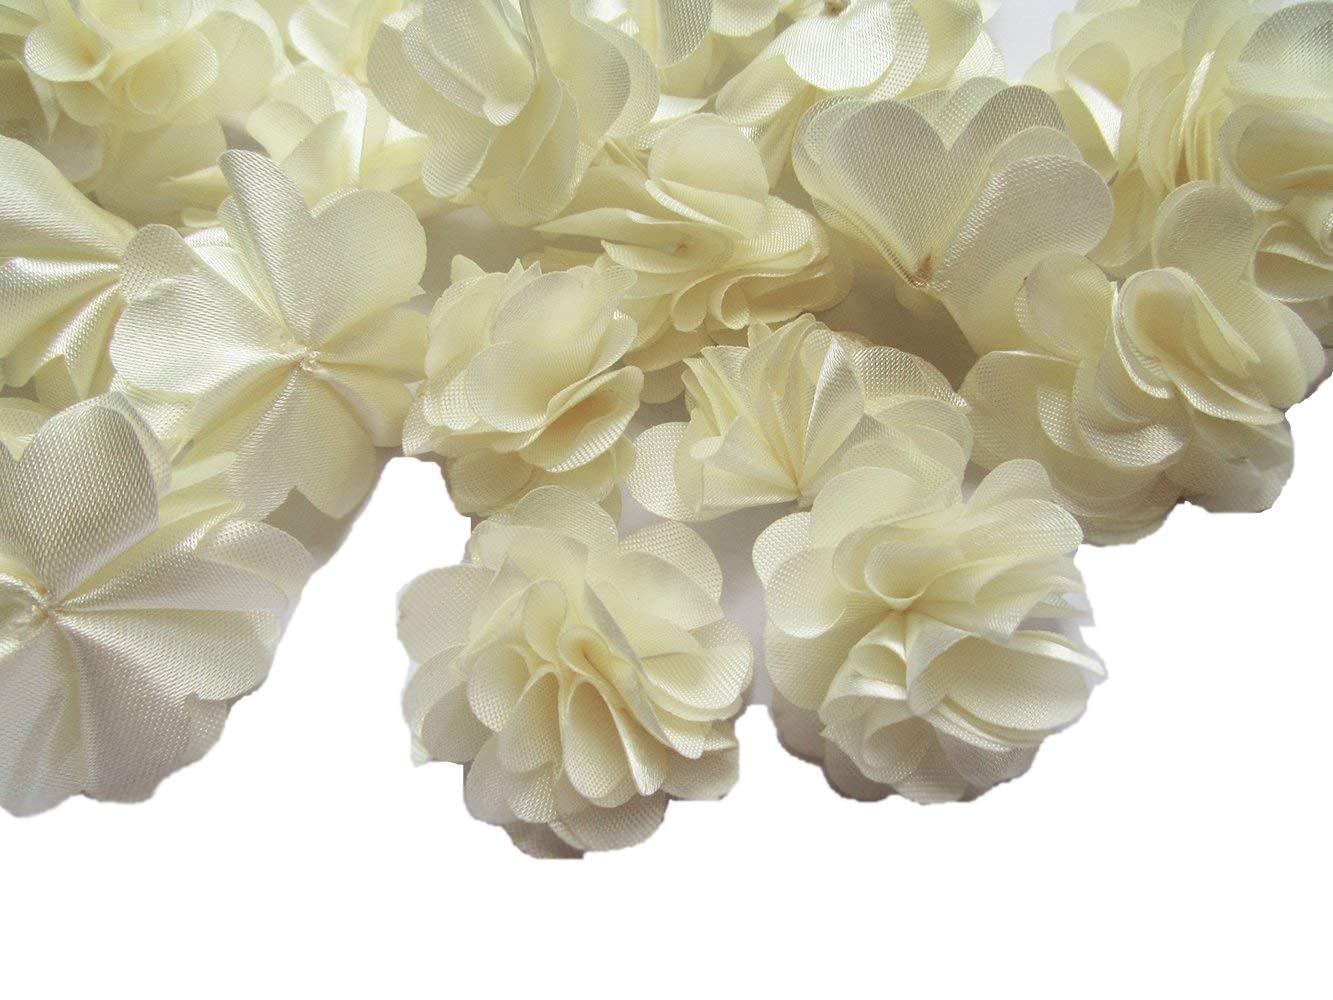 YYCRAFT-20pcs-1-14-Handmade-Sewn-Satin-Flowers-DIY-Flower-for-Headbands-CraftWedding-Party-Decoration